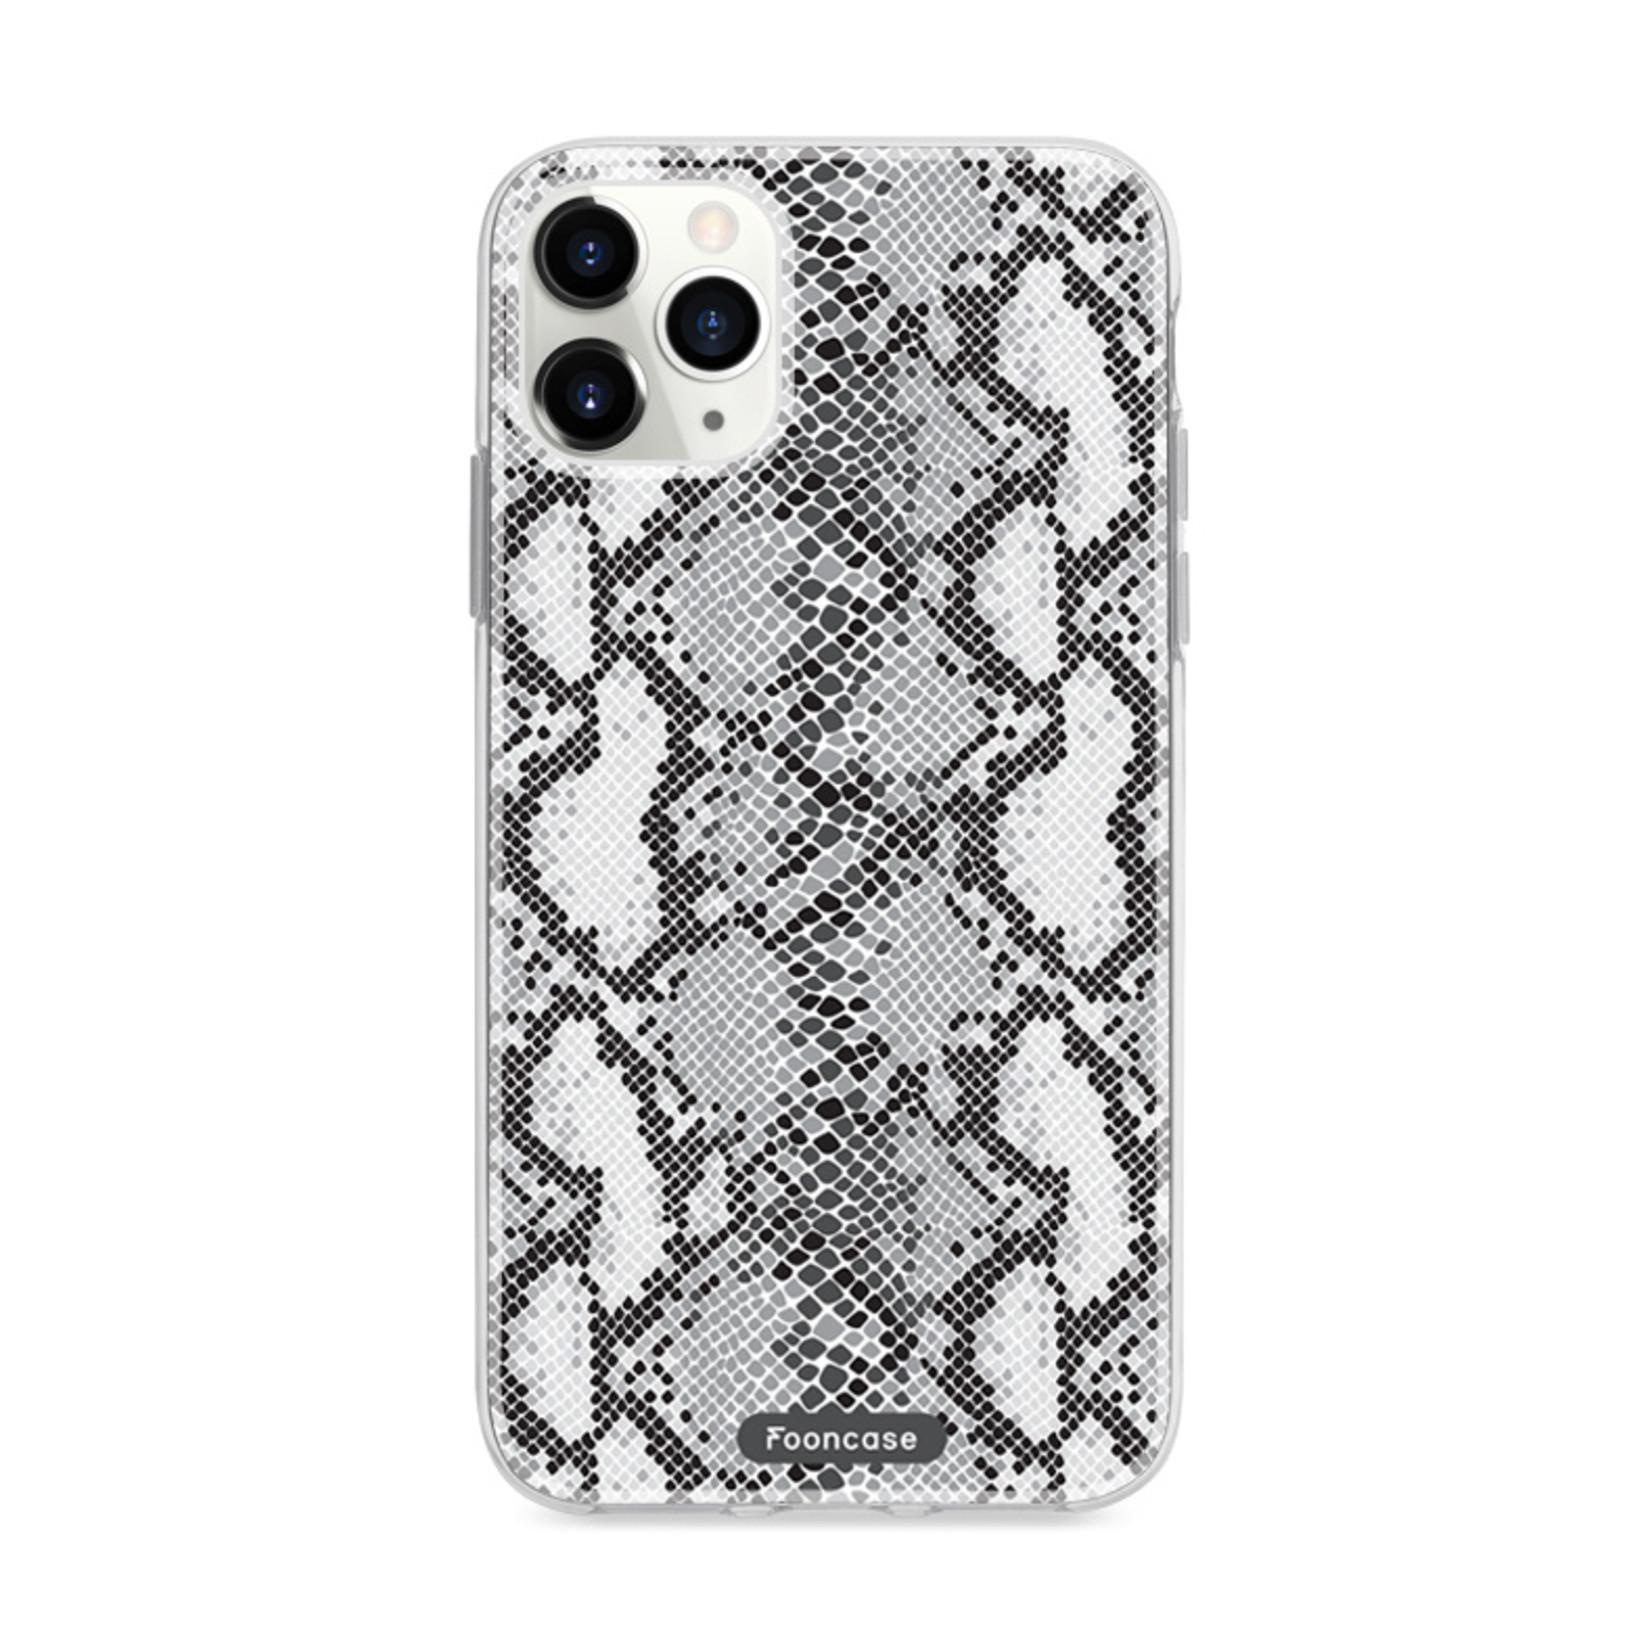 FOONCASE iPhone 11 Pro hoesje TPU Soft Case - Back Cover Ð Snake it / Slangen print